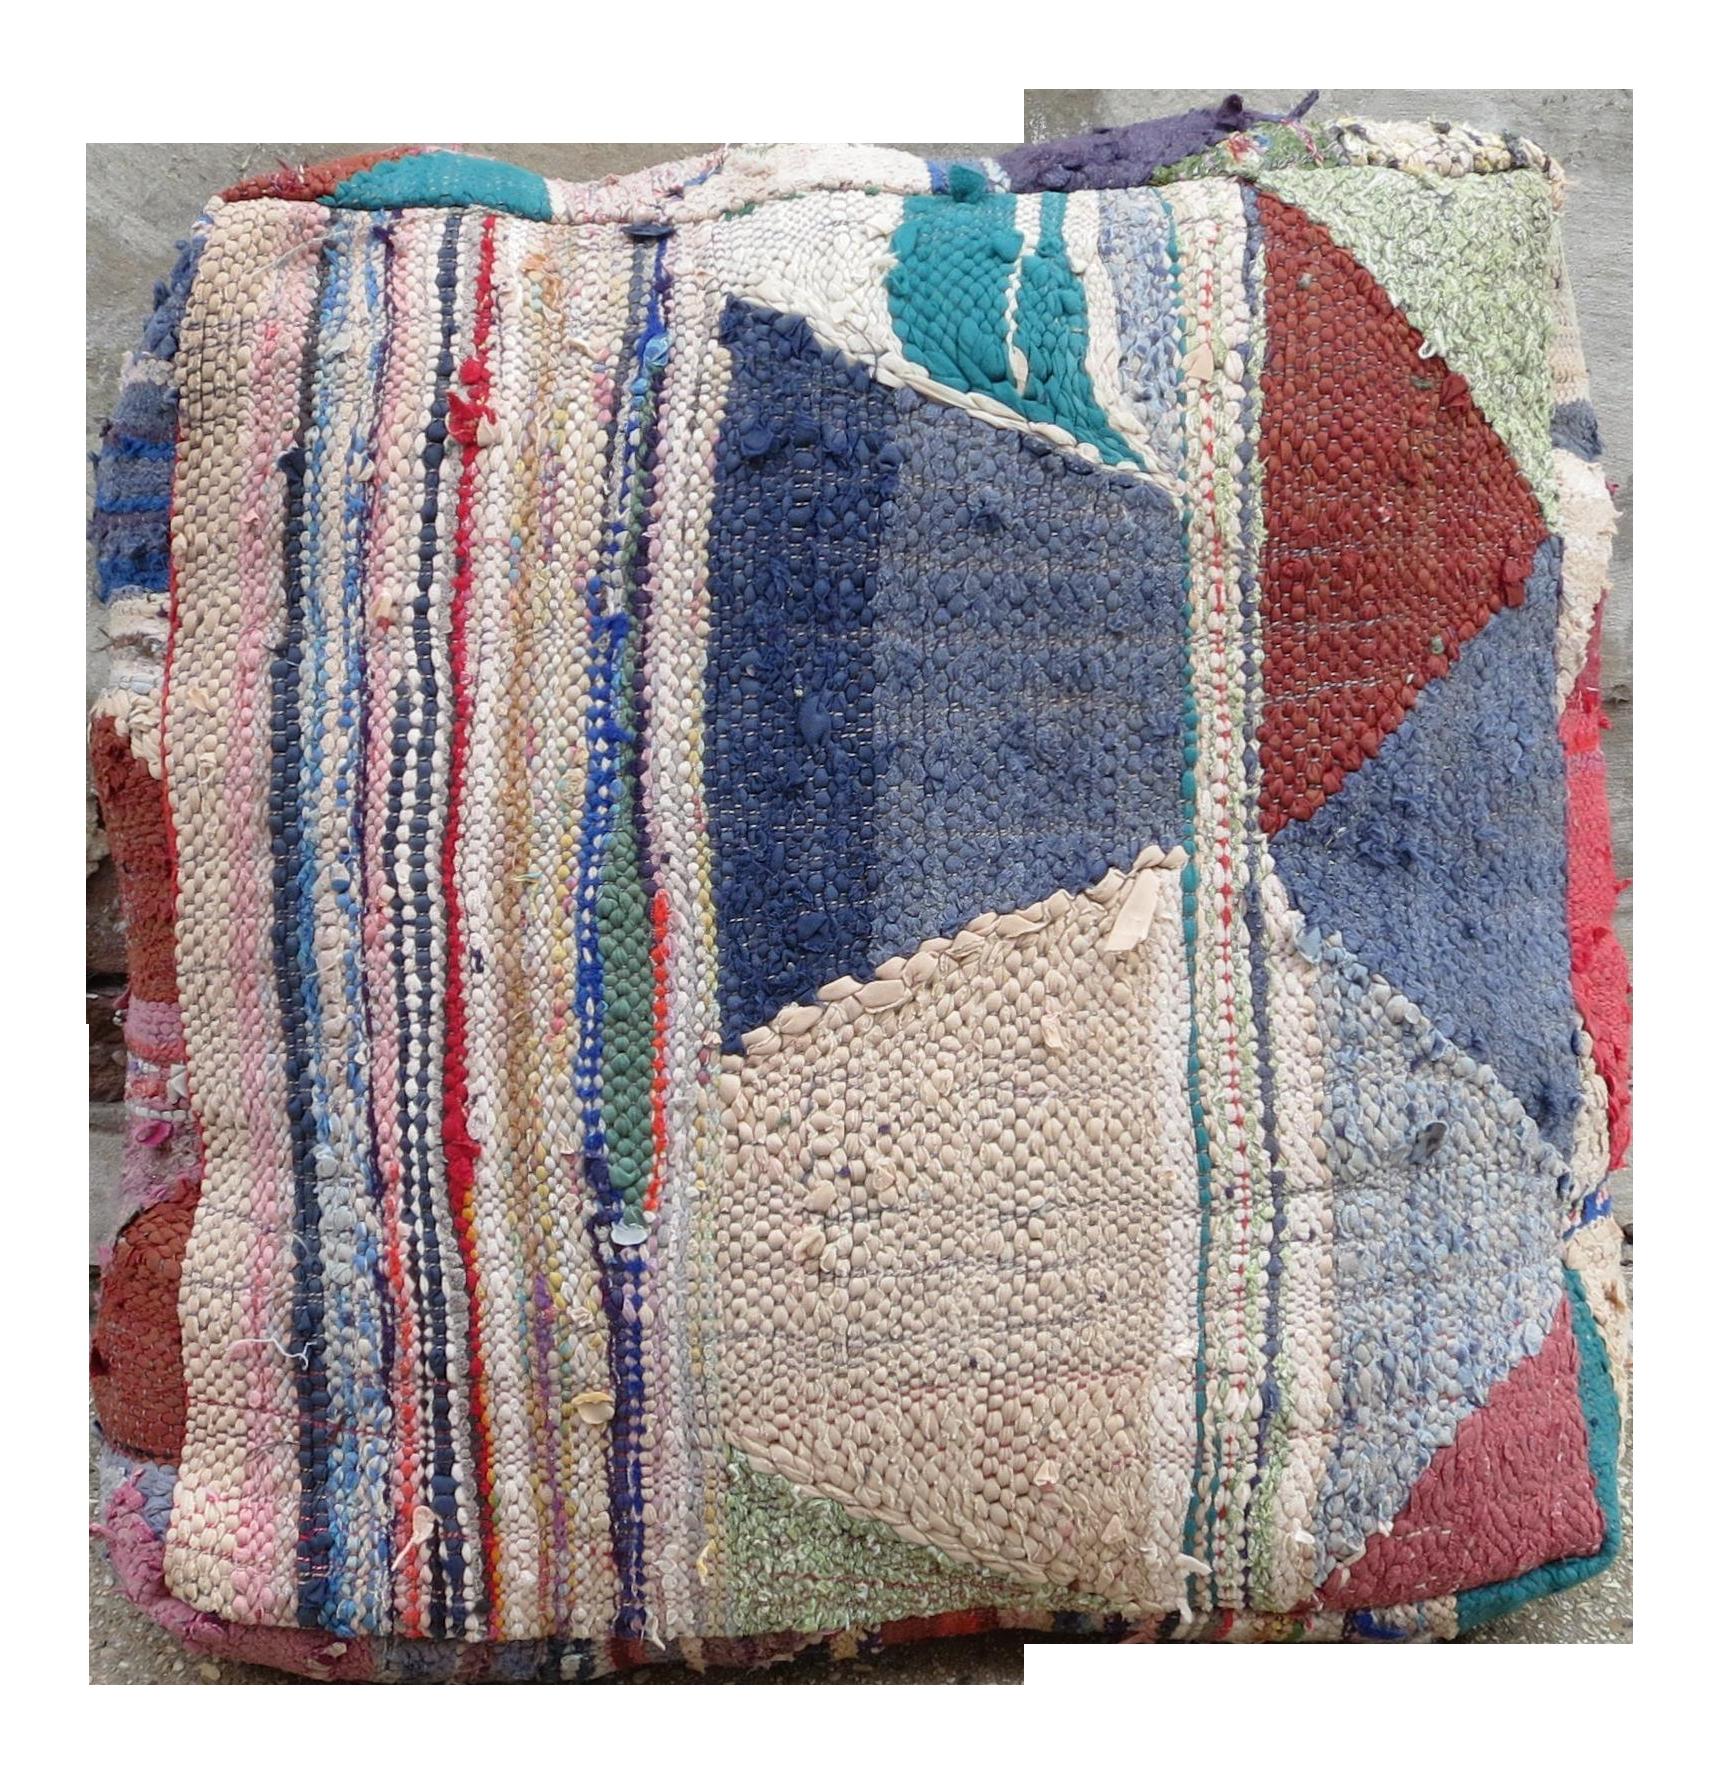 How To Make Moroccan Floor Pillows : Moroccan Floor Pillow Chairish